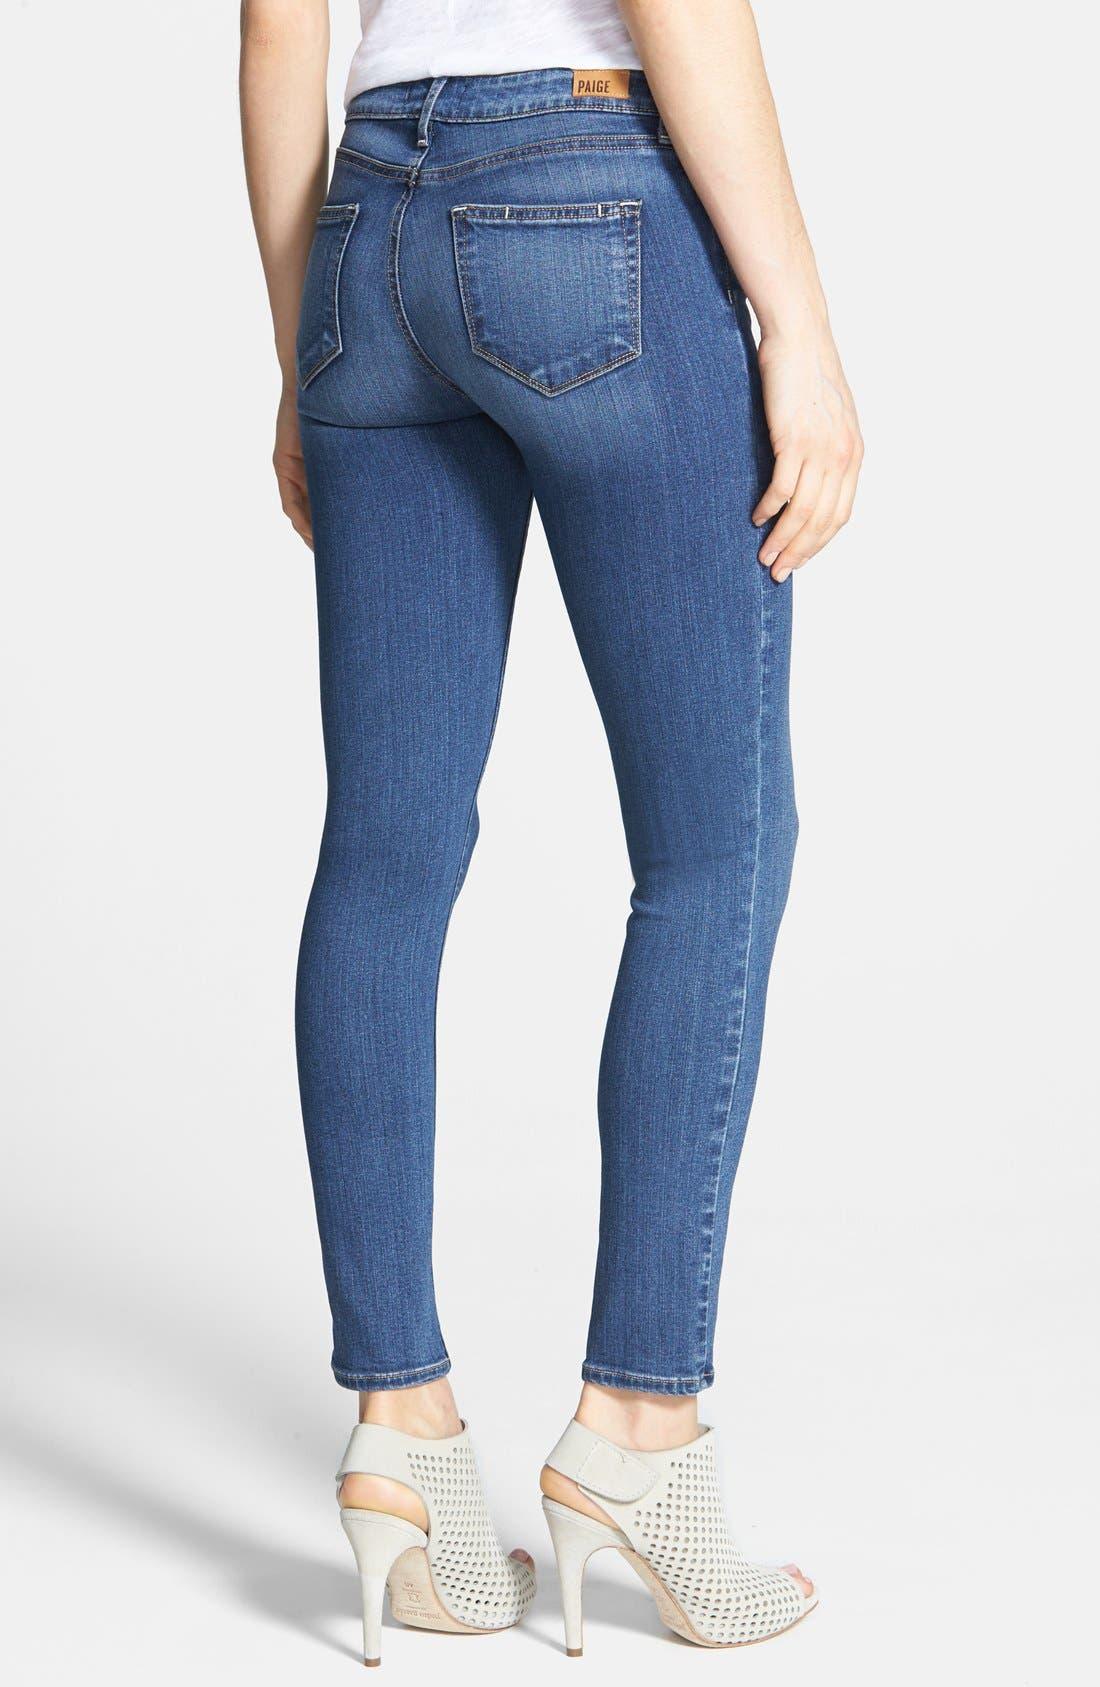 Transcend - Verdugo Ankle Skinny Jeans,                             Alternate thumbnail 8, color,                             TRISTAN